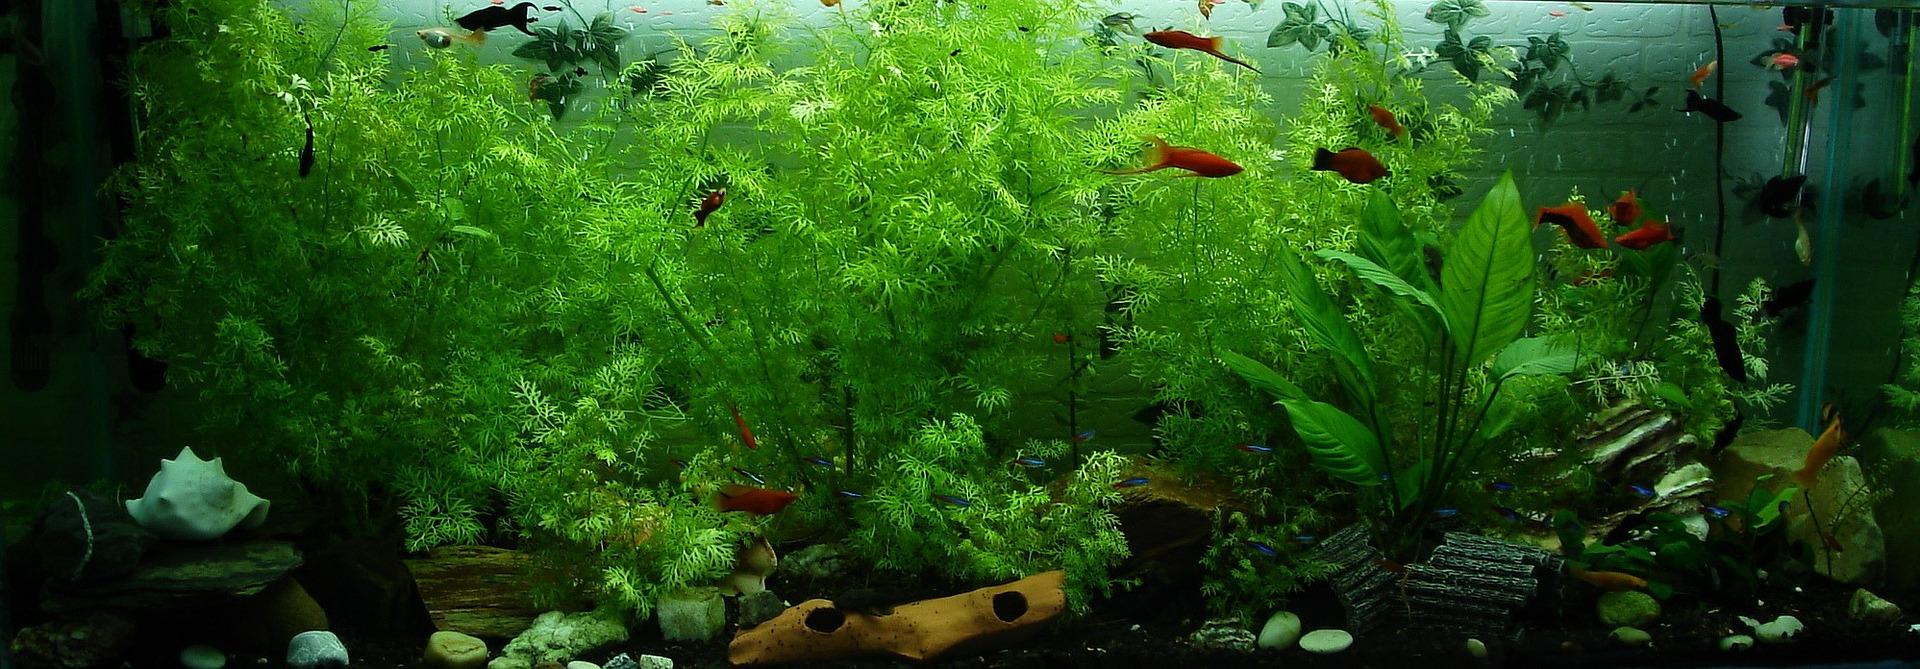 ammonia poisoning fish